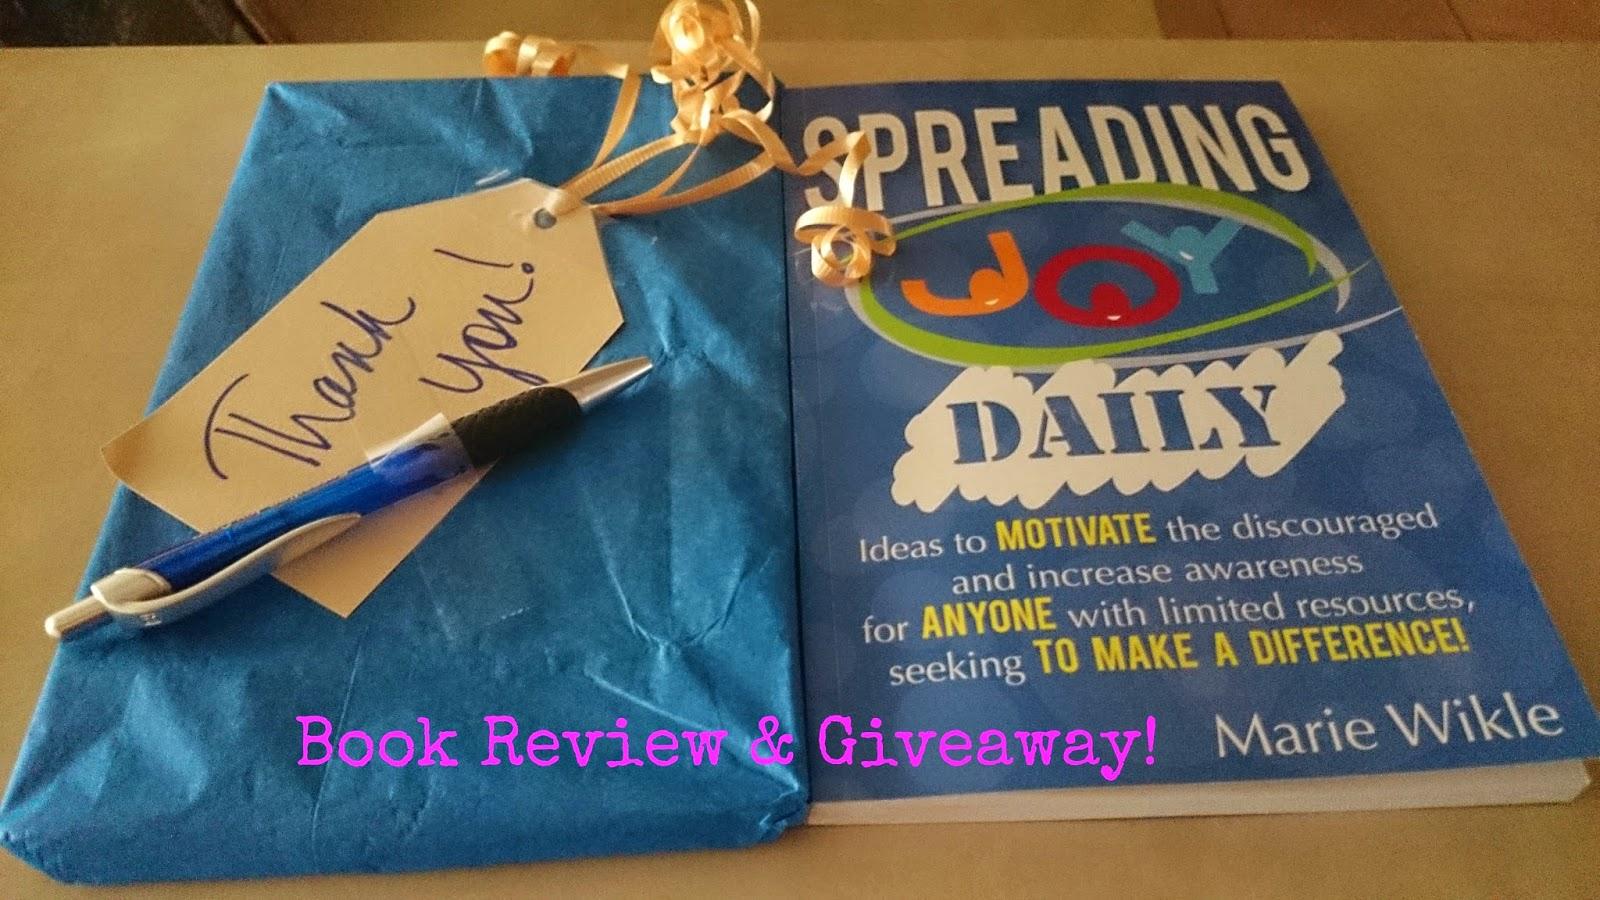 http://raisingsamuels.blogspot.com/2014/06/book-review-giveaway-spreading-joy.html